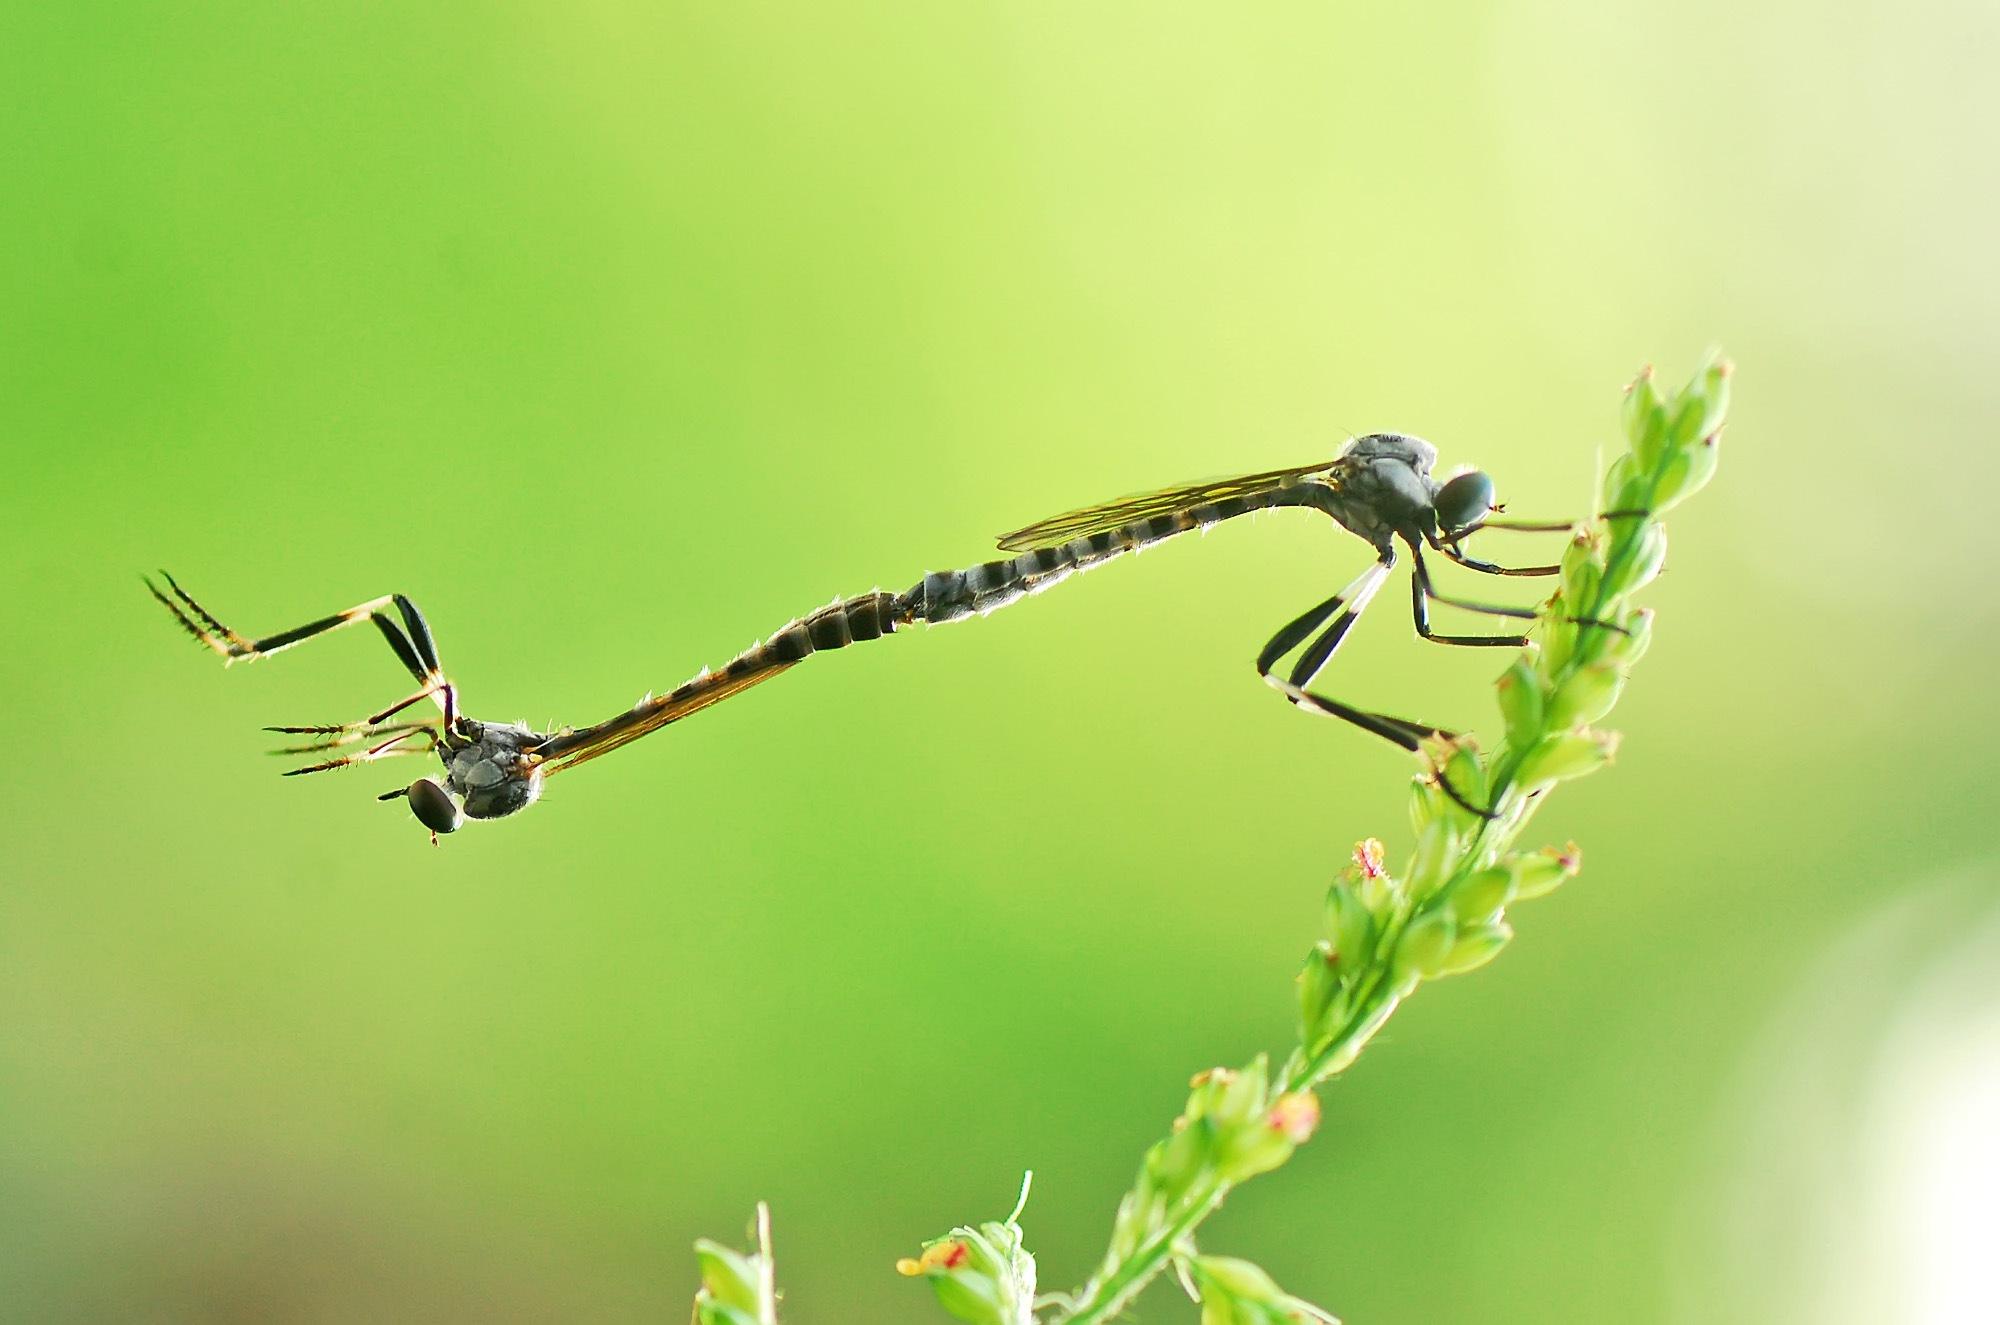 Robber fly,Asilidae,Mating by ujangwahyudin